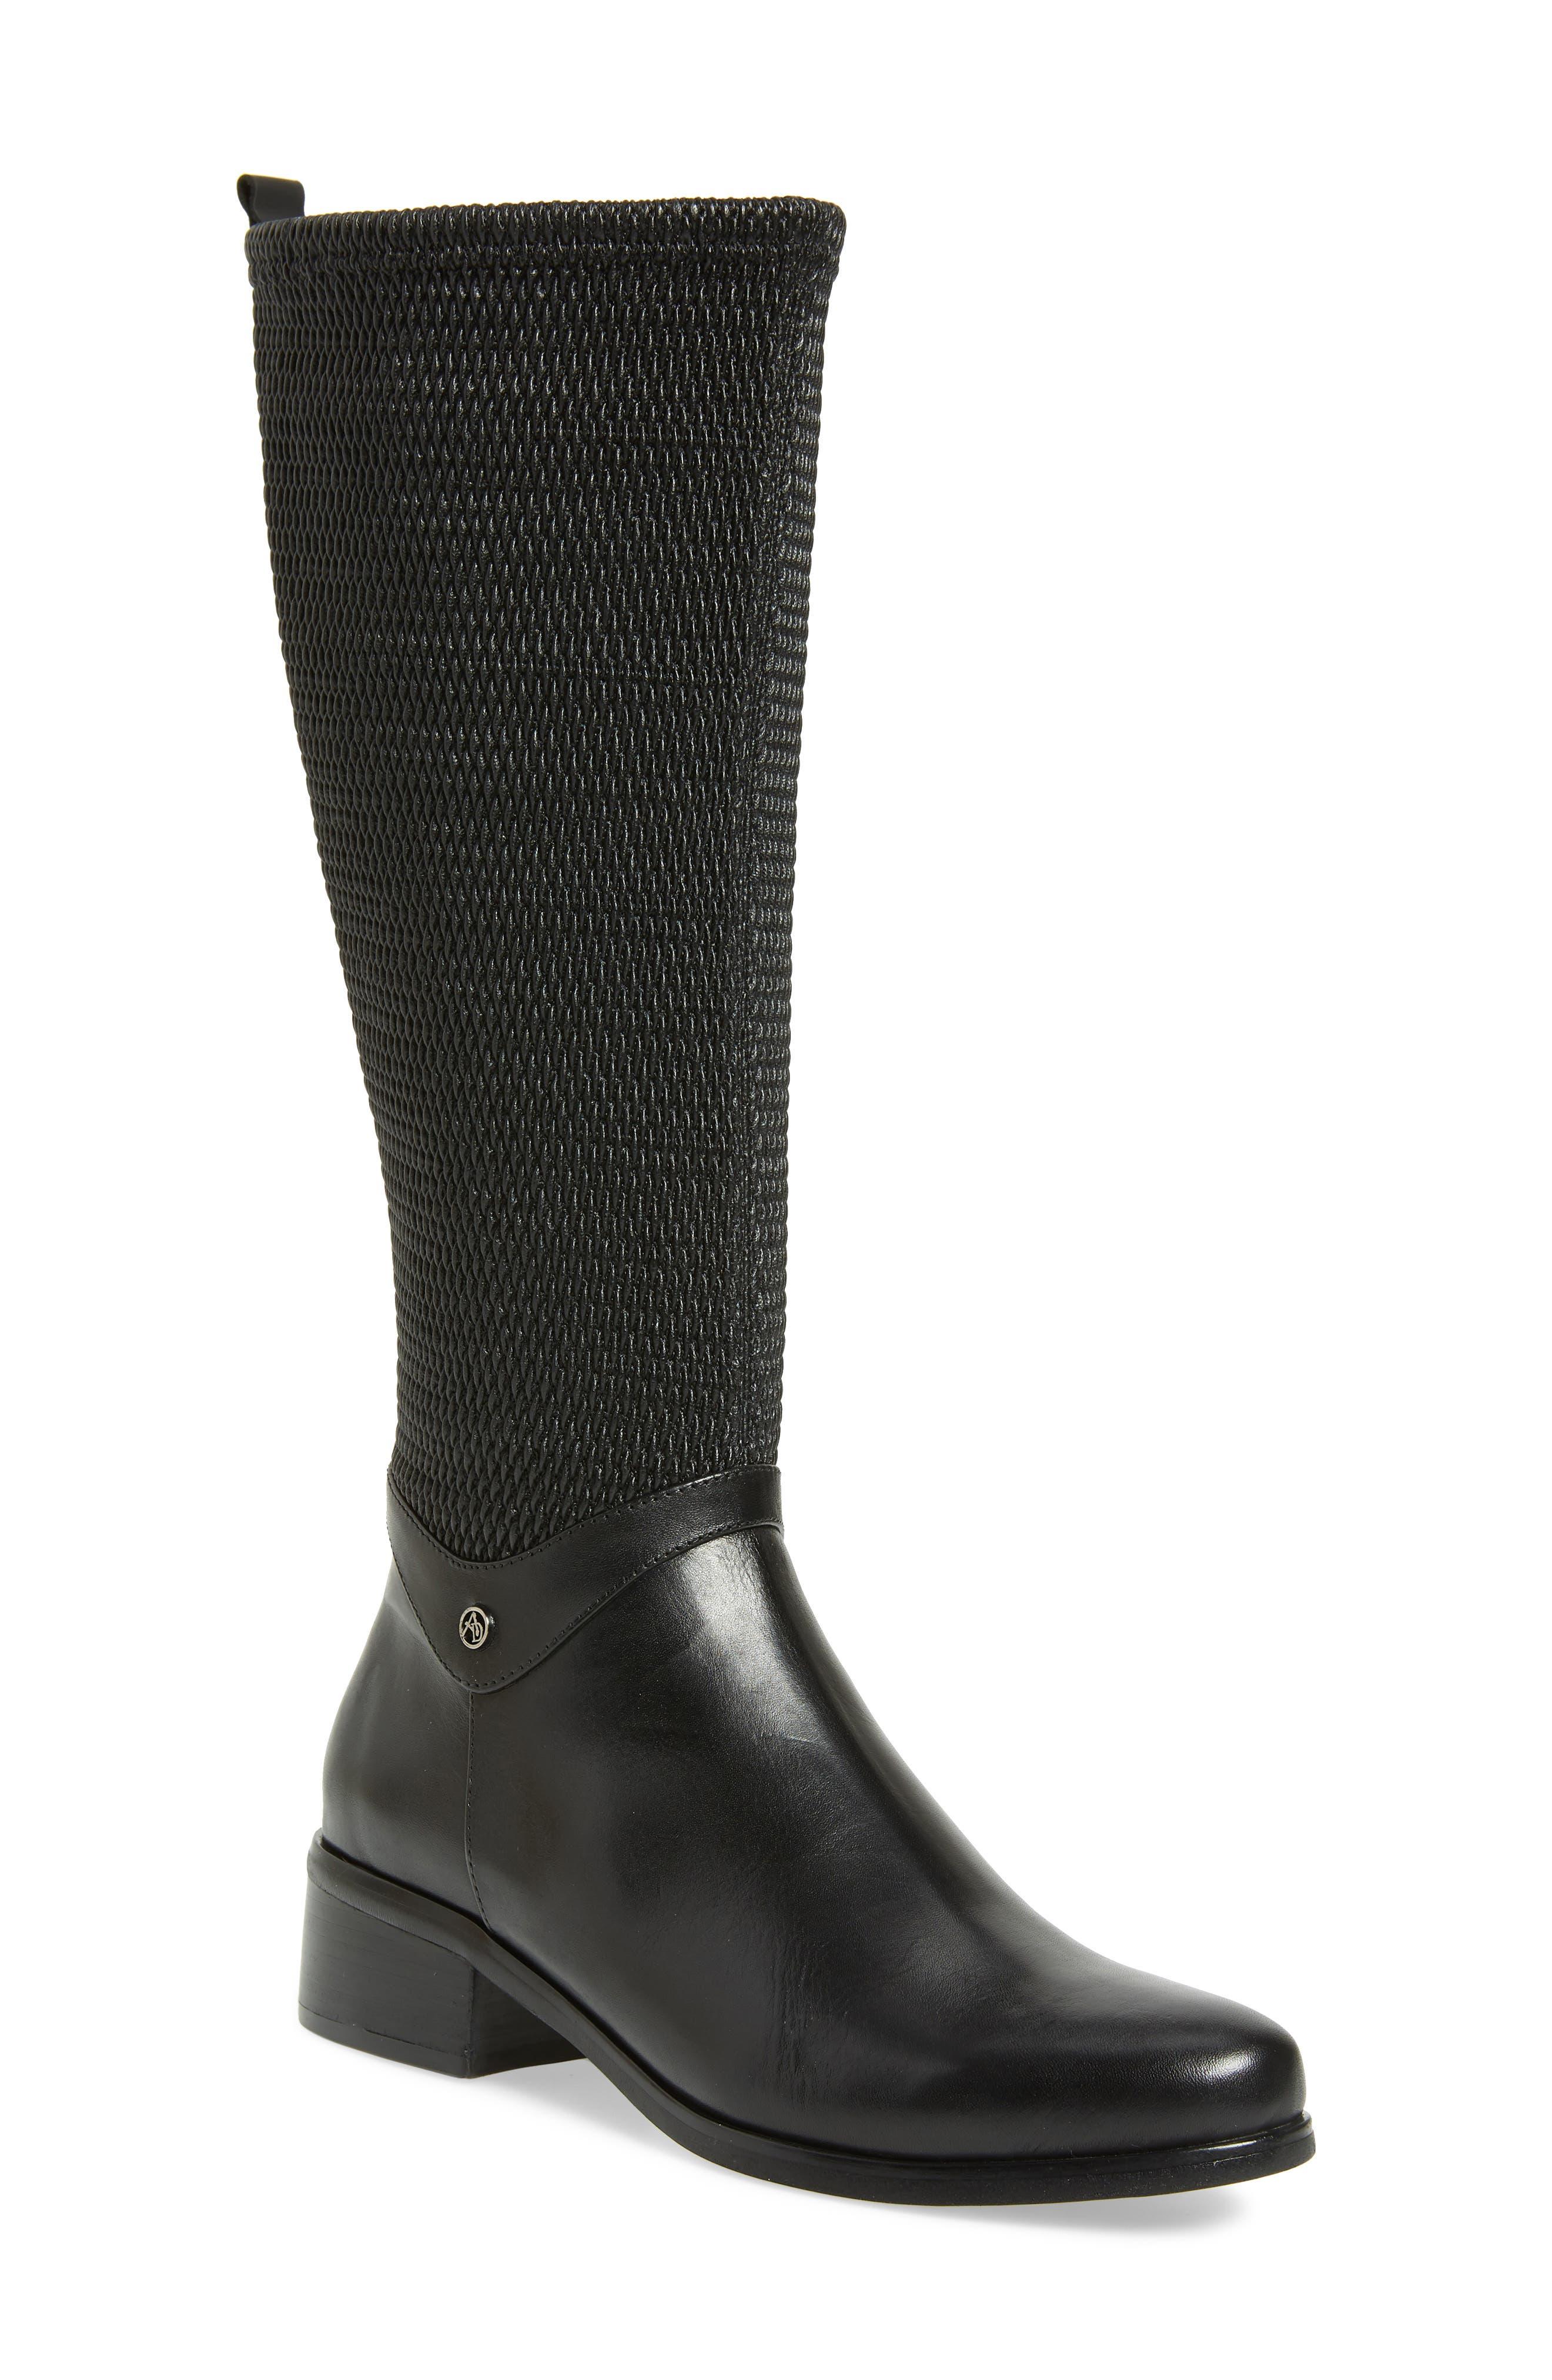 AQUADIVA,                             Kallena Waterproof Knee High Boot,                             Main thumbnail 1, color,                             BLACK LEATHER